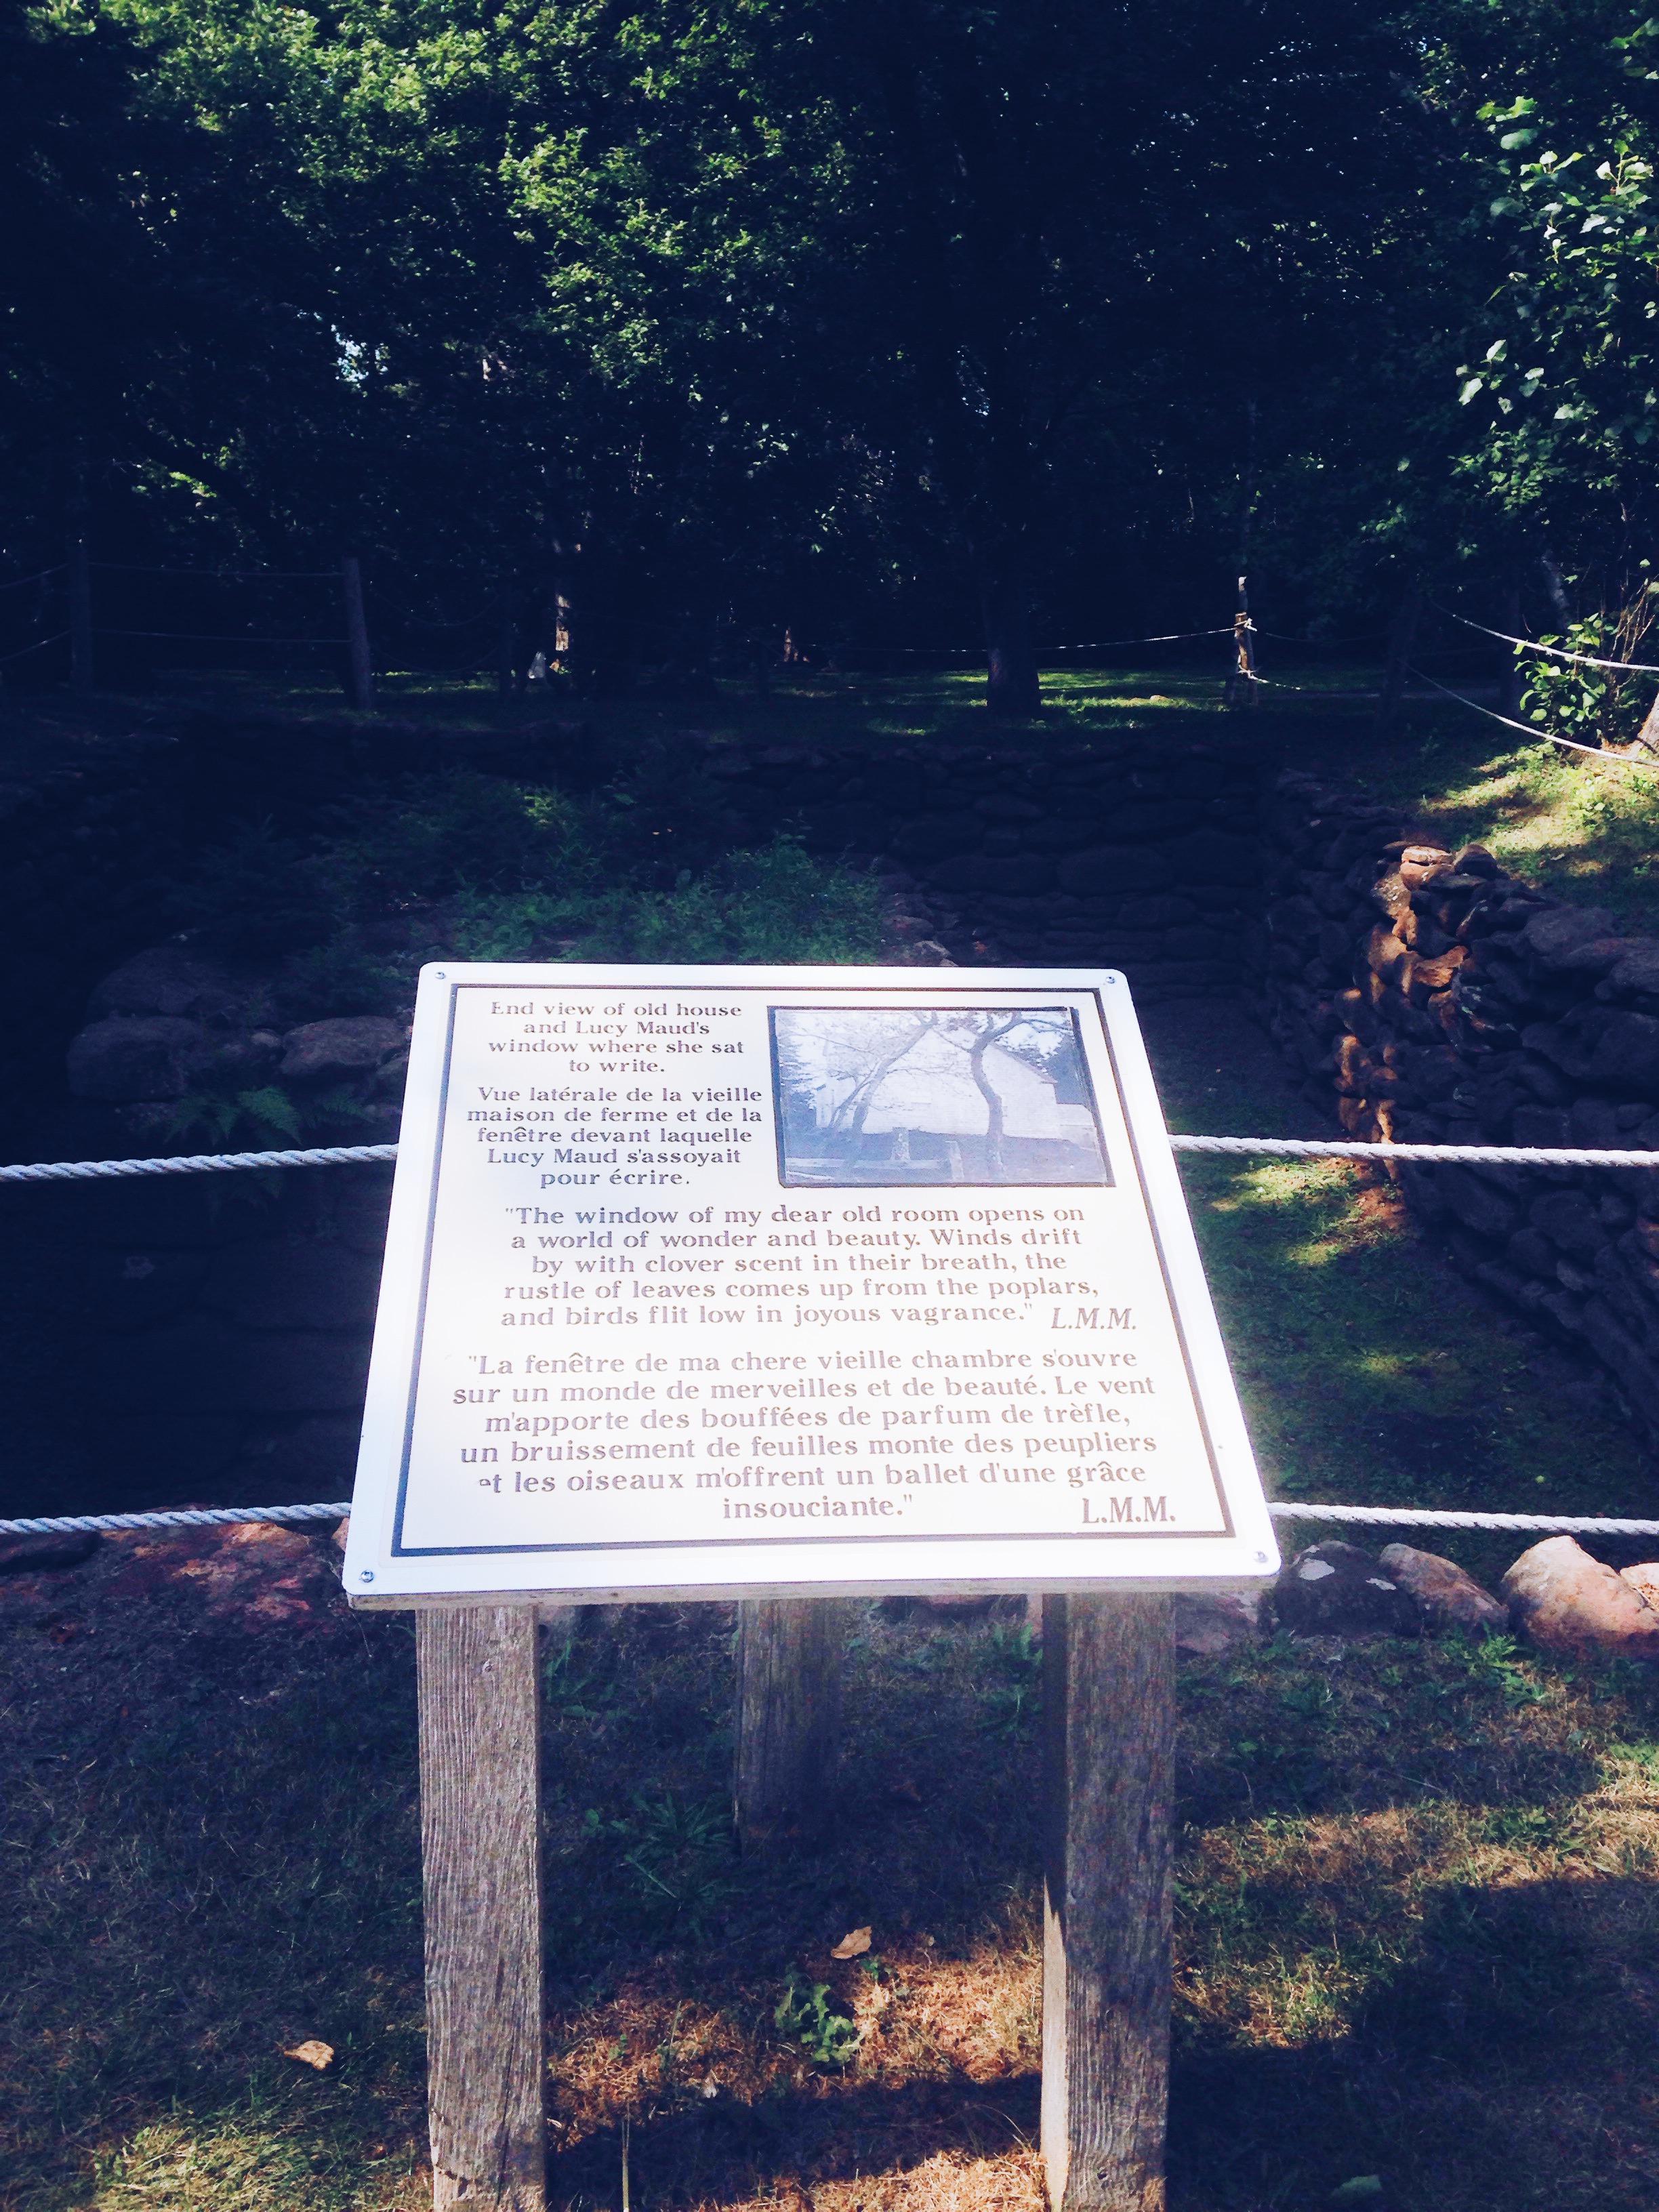 www.justbeingbrooklyn.com/lookingbackonhistory